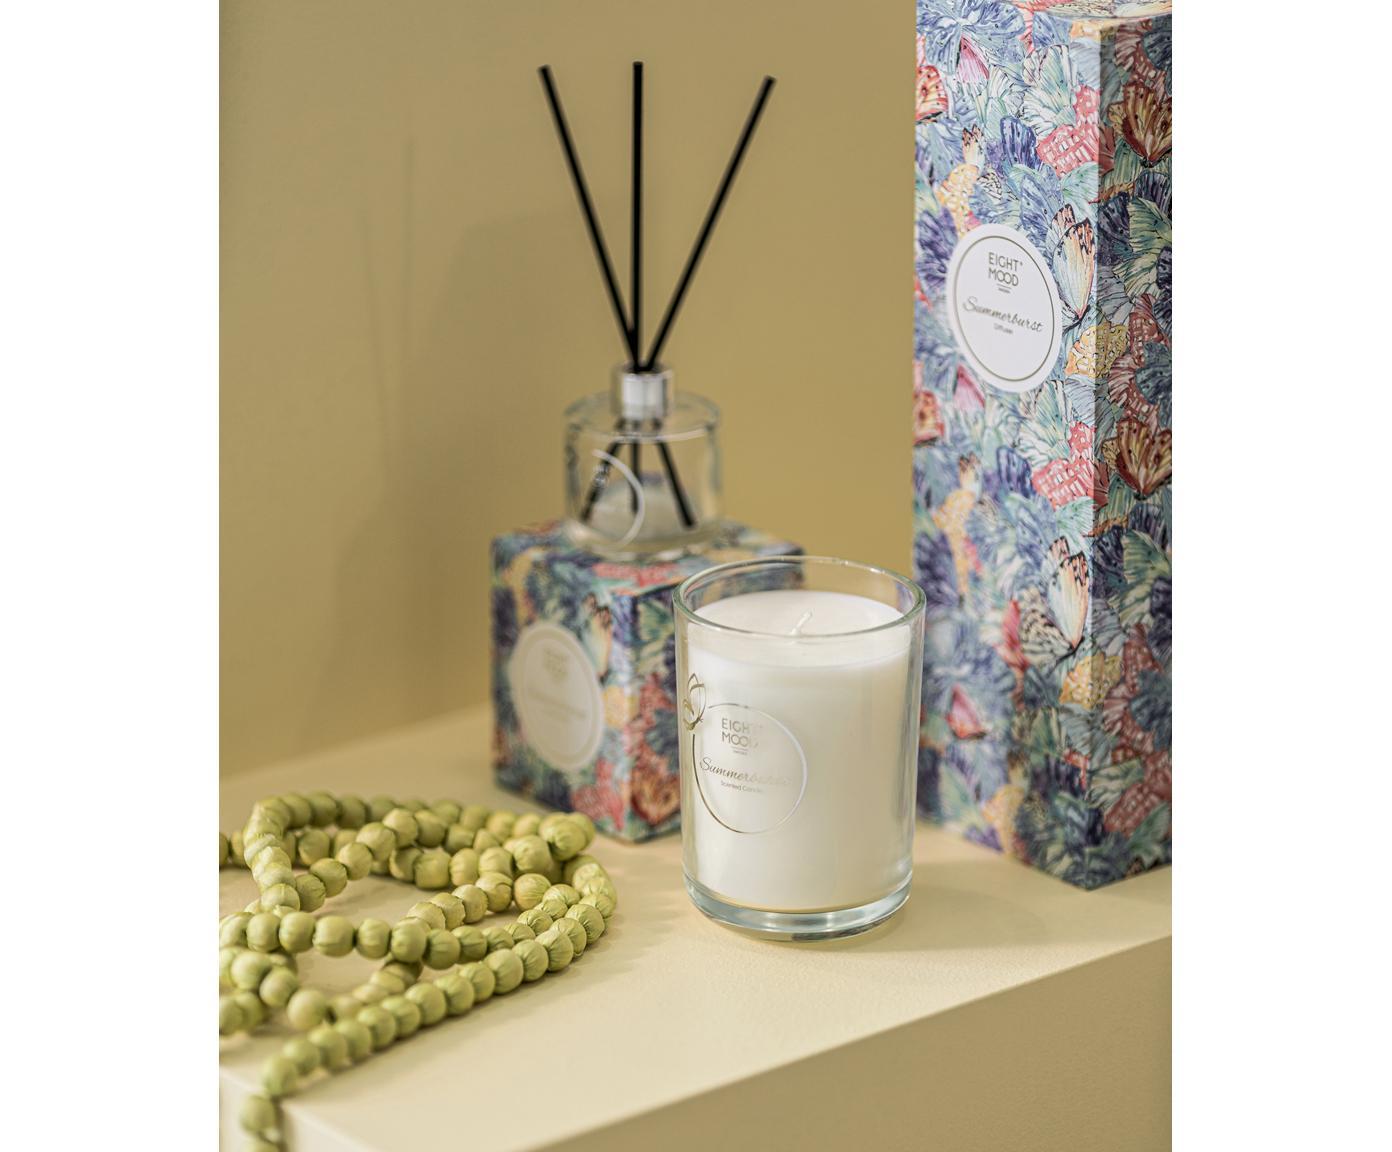 Diffuser & Duftkerze Summerburst (Apfel, Cassis & Orange), 2er-Set, Box: Papier, Behälter: Glas, Mehrfarbig, 10 x 22 cm